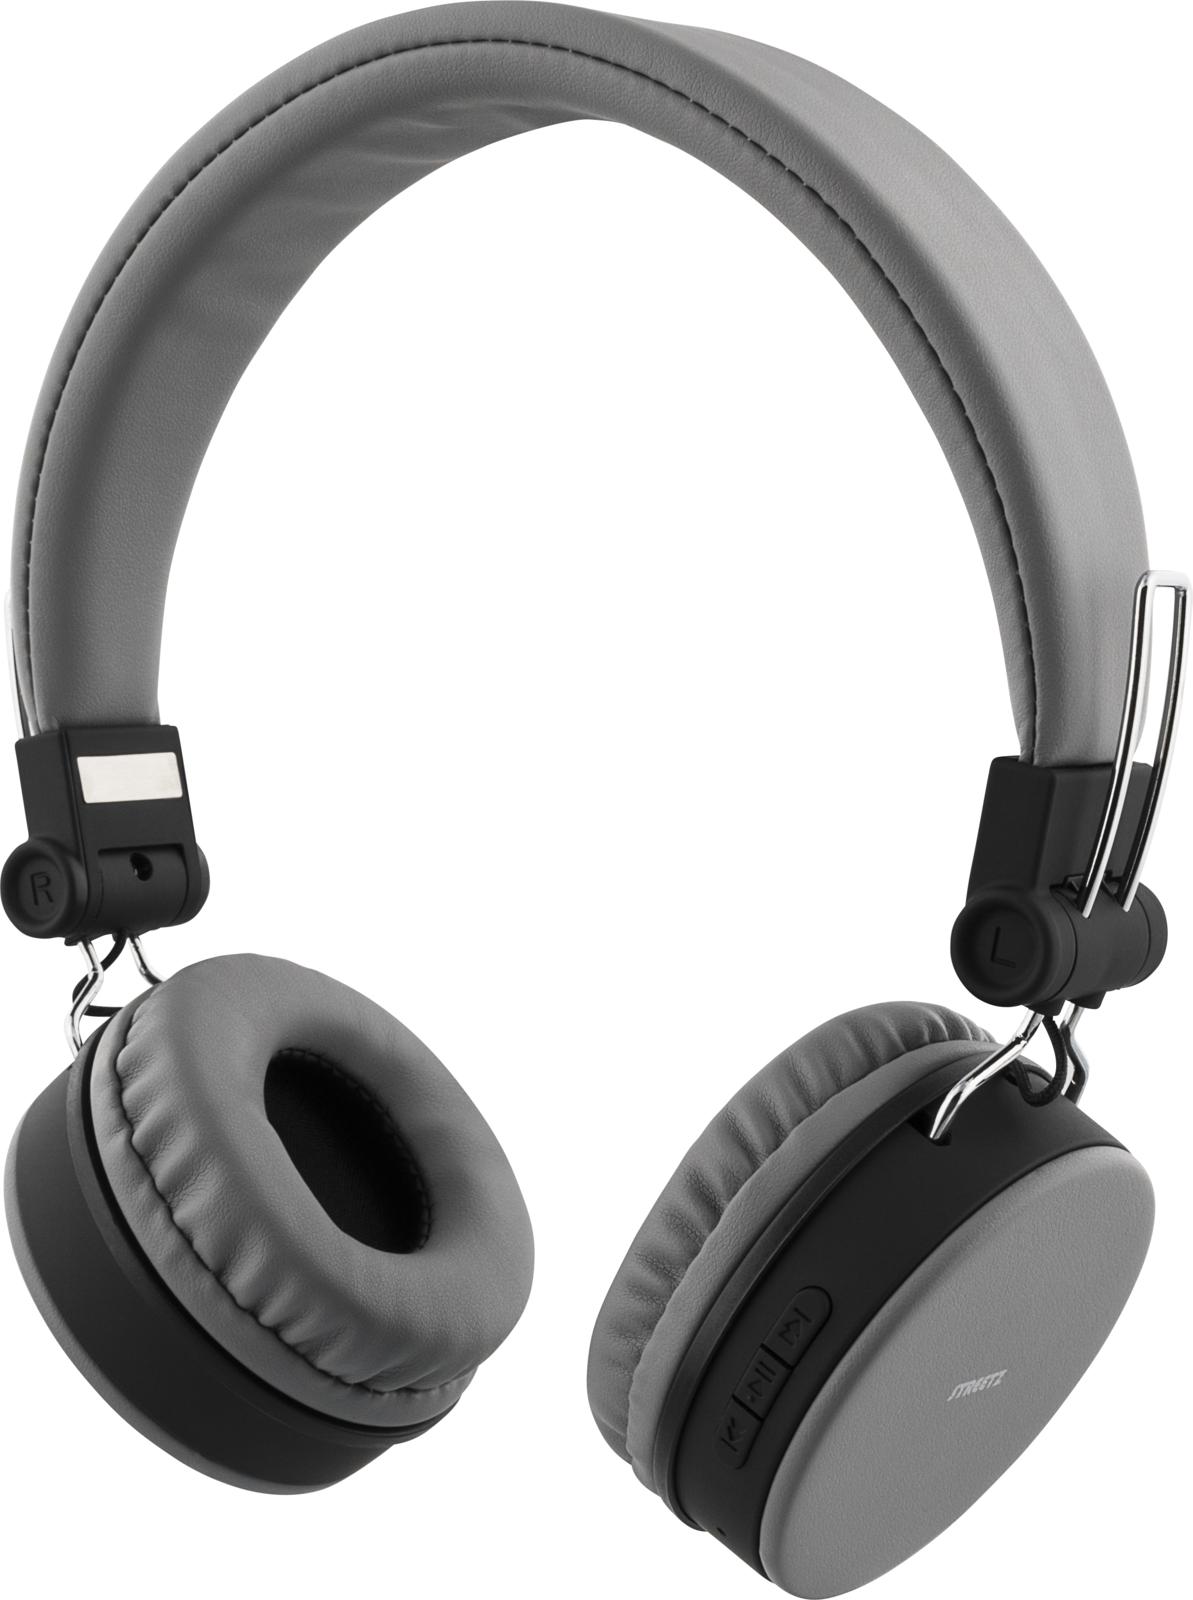 Köp Streetz Headset med Bluetooth - iPhonebutiken.se 2ab3cd5faf246